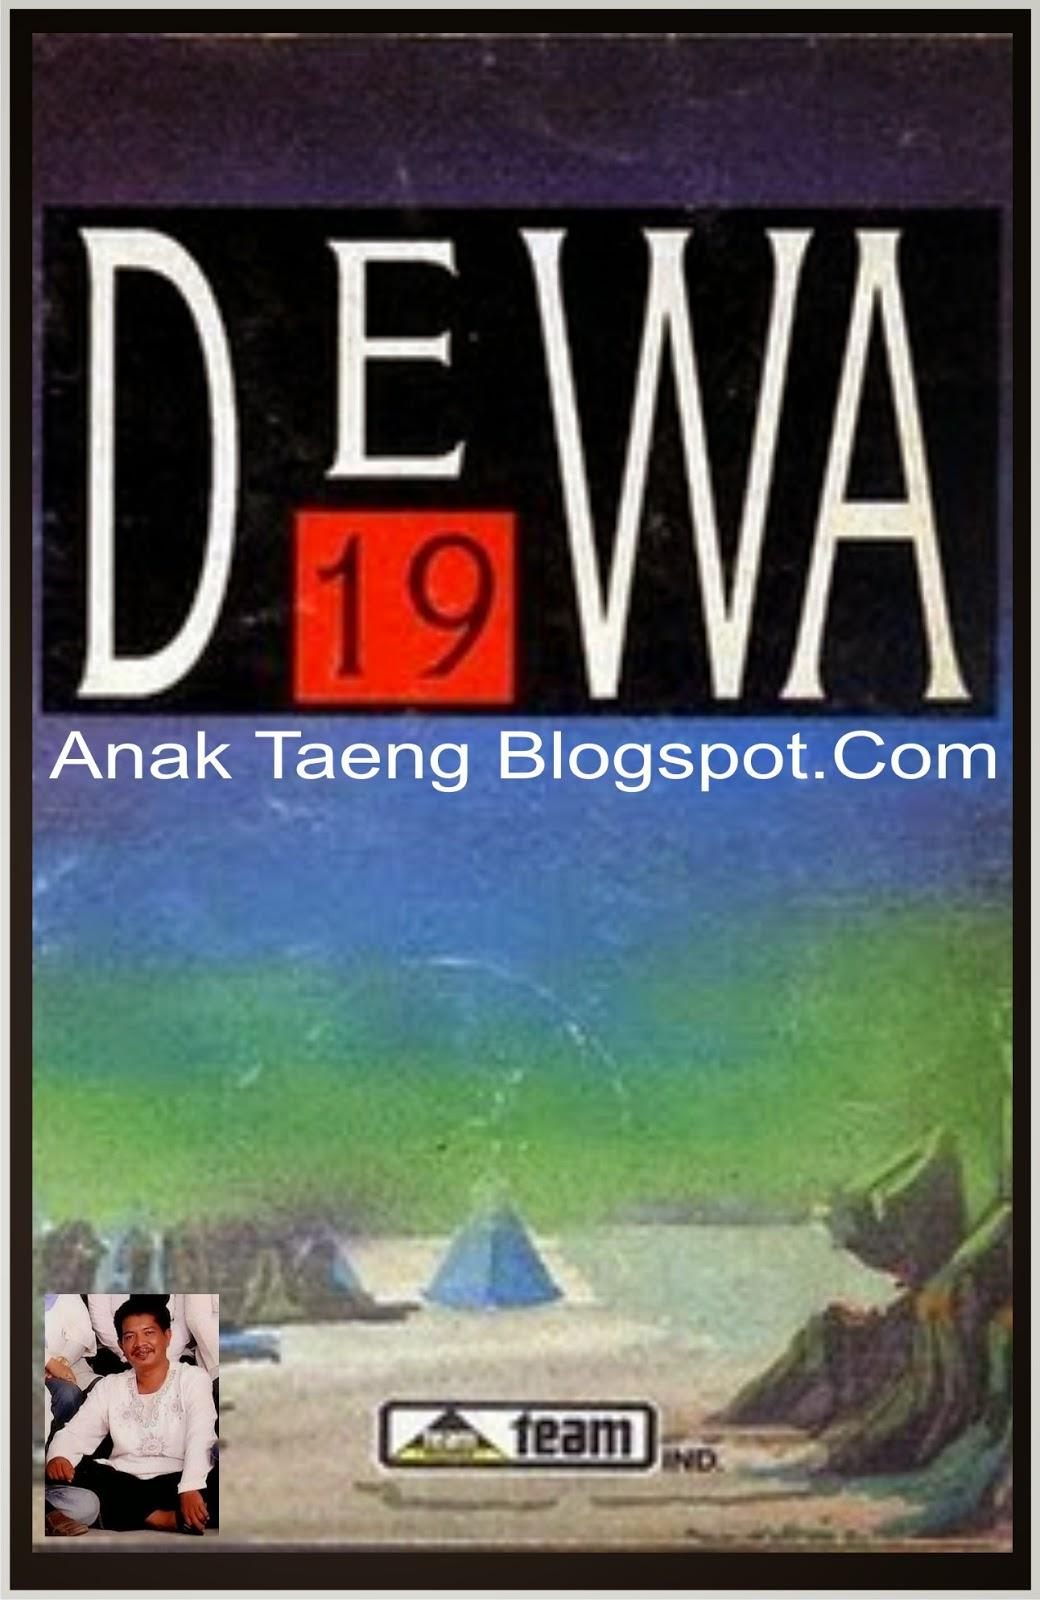 Dewa 19 Selatan Jakarta Mp3 Download - WhatsMp3com